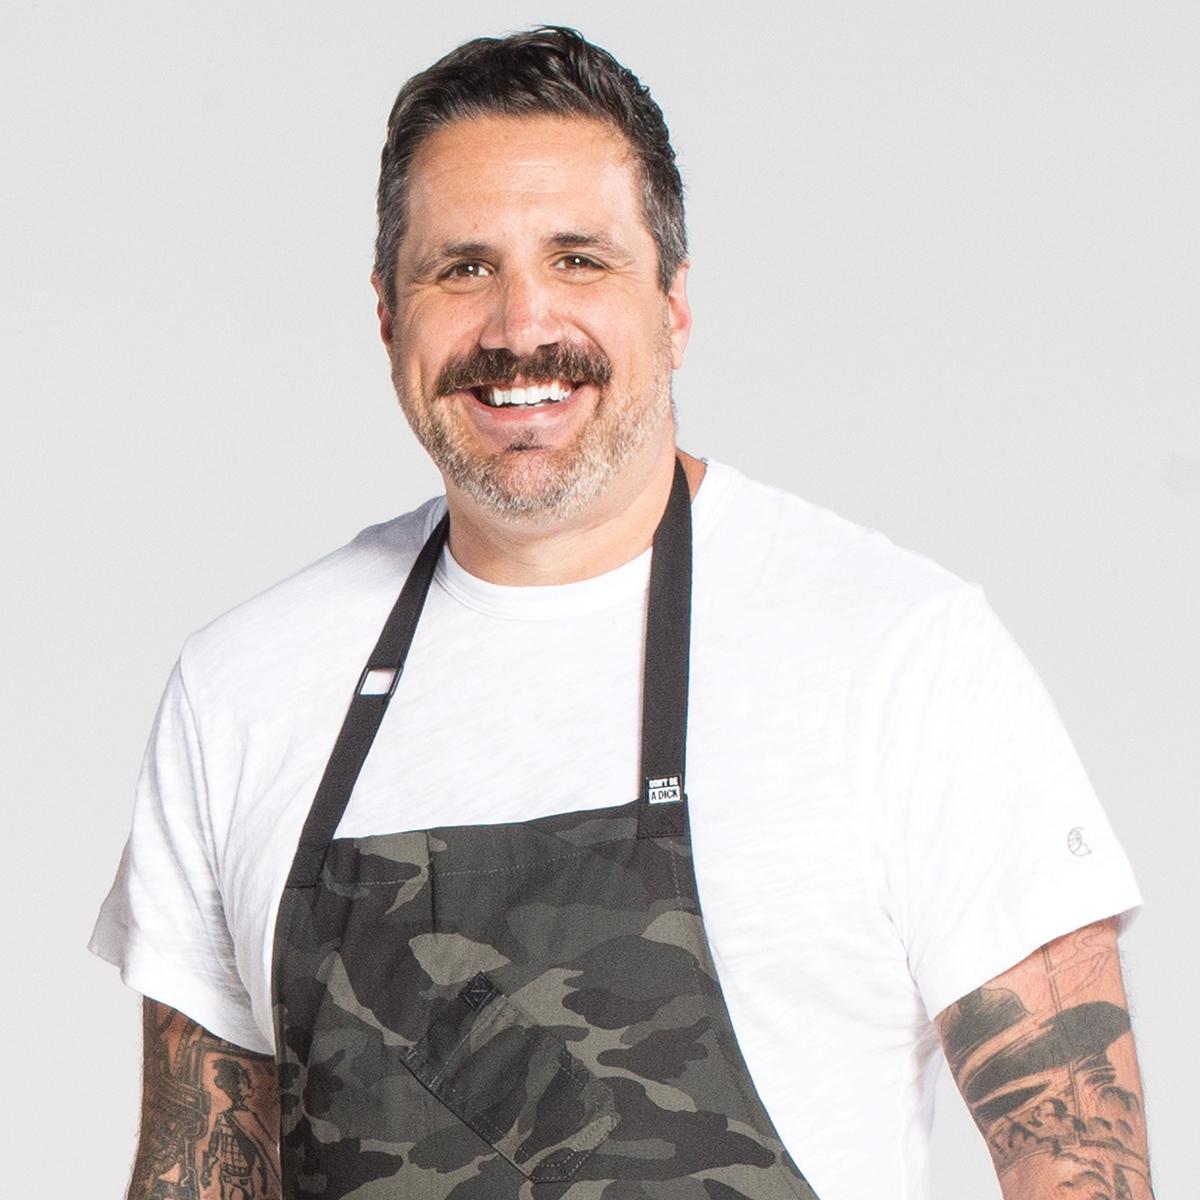 Chef Michael Scelfo is opening Longfellow Bar